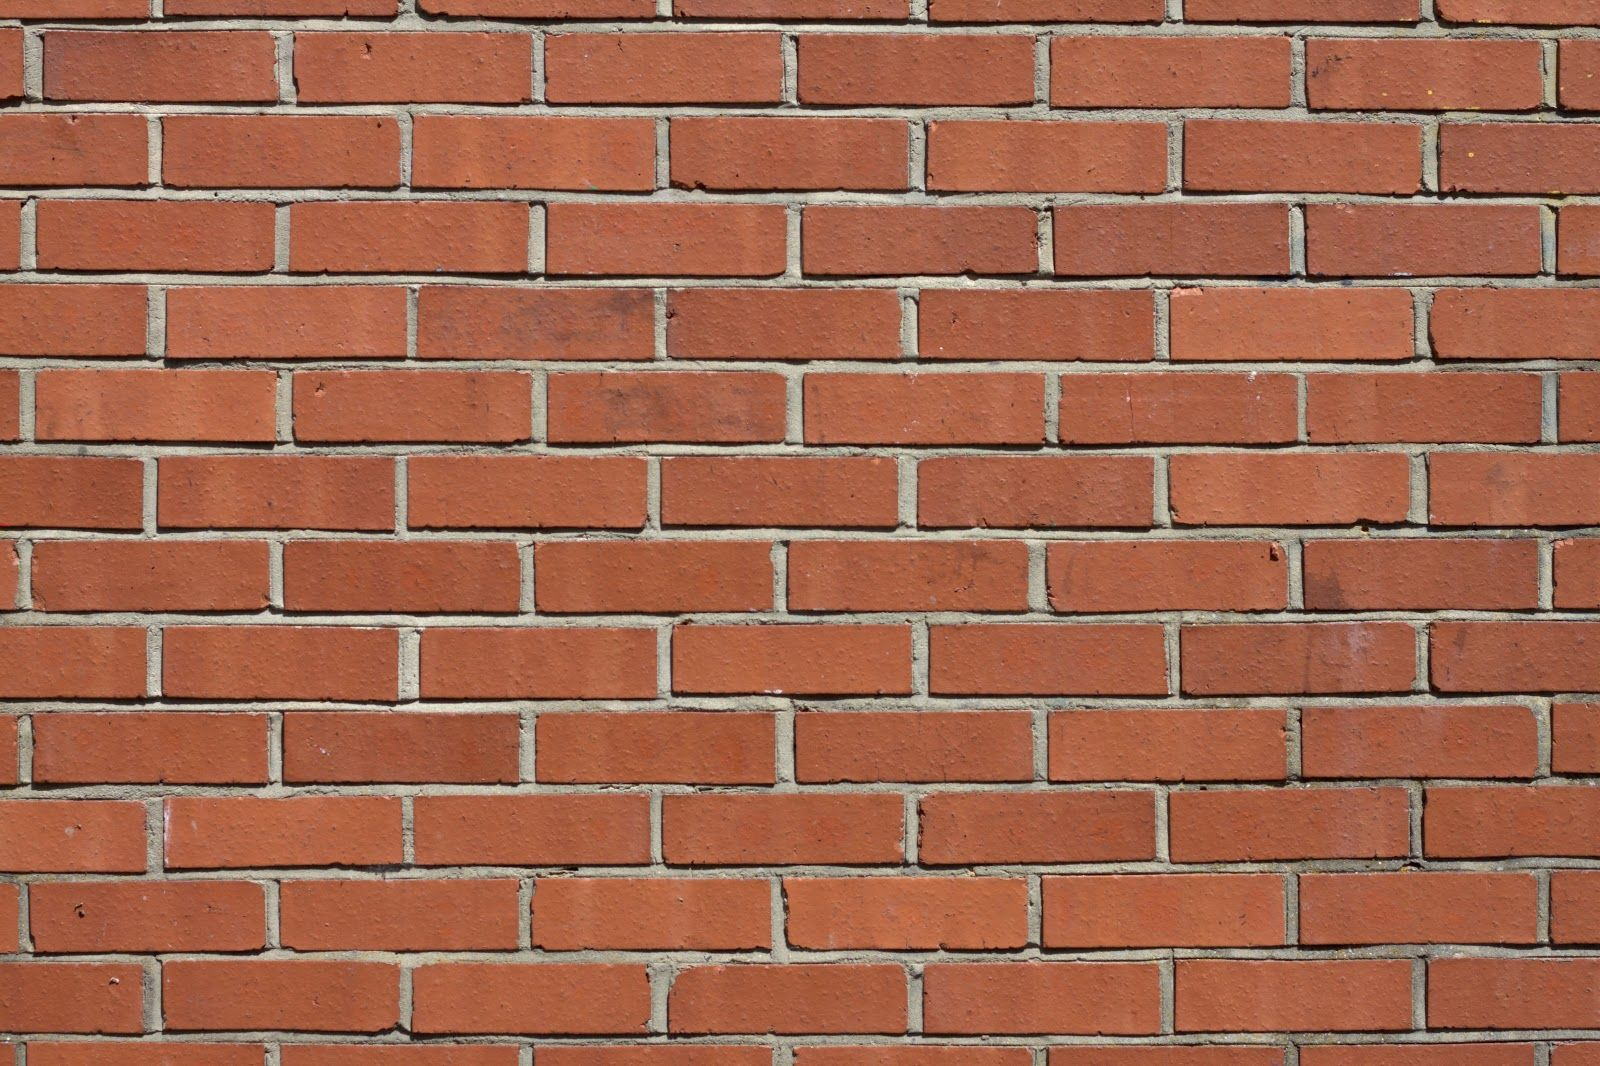 Brick Wall Building Texture Ver 6 Gimp Textures Pinterest Bricks